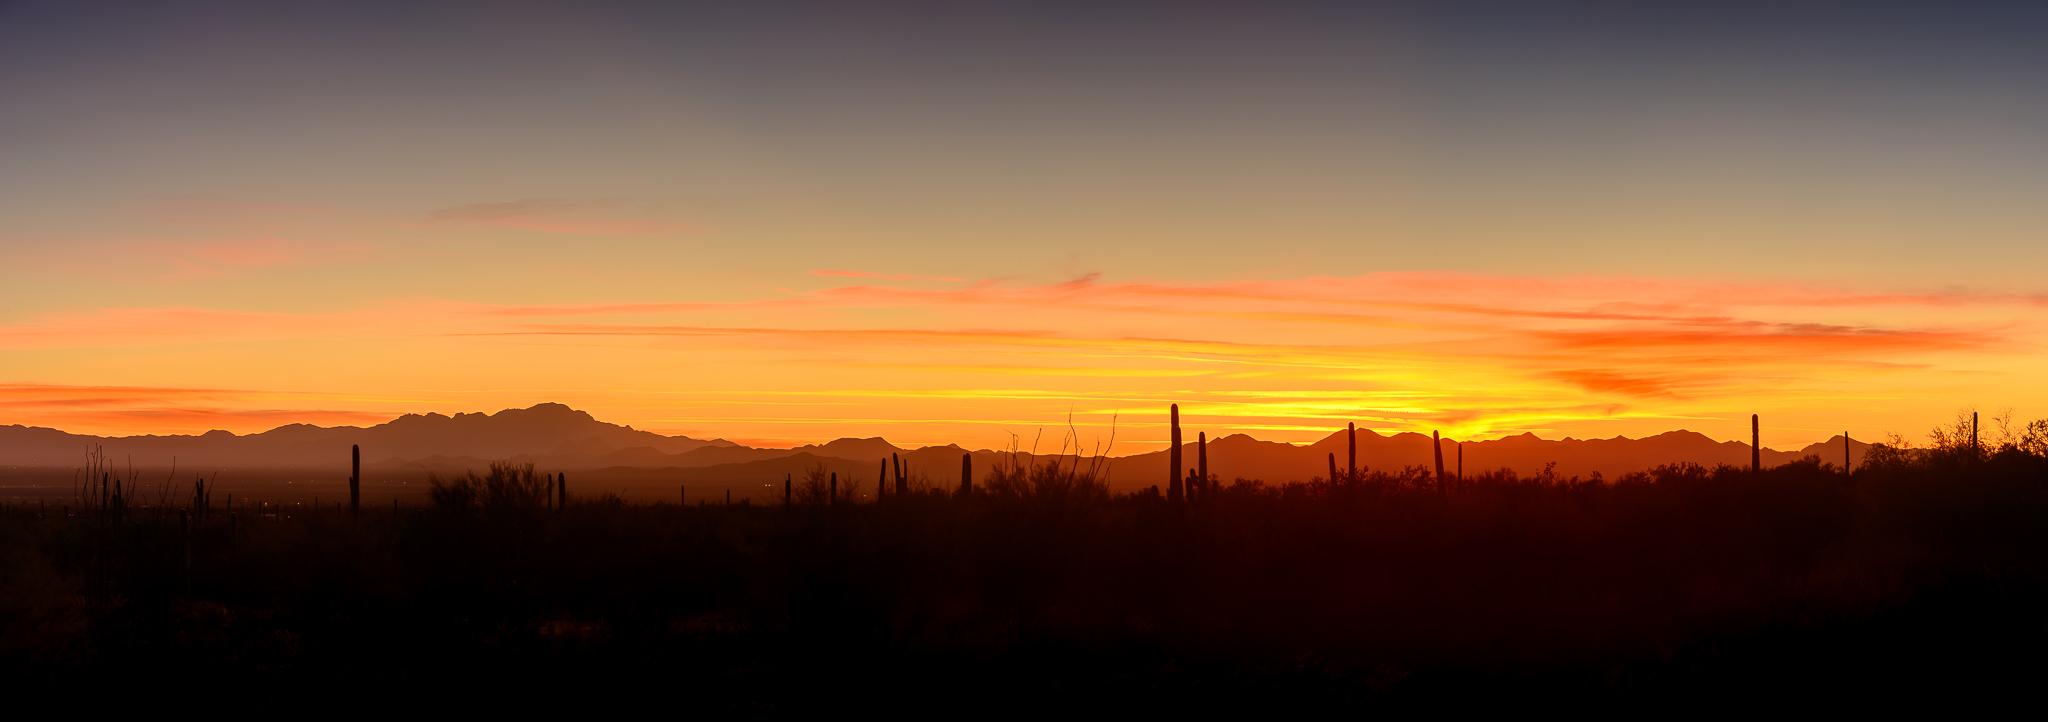 Send off salute. Saguaro National Park, AZ.